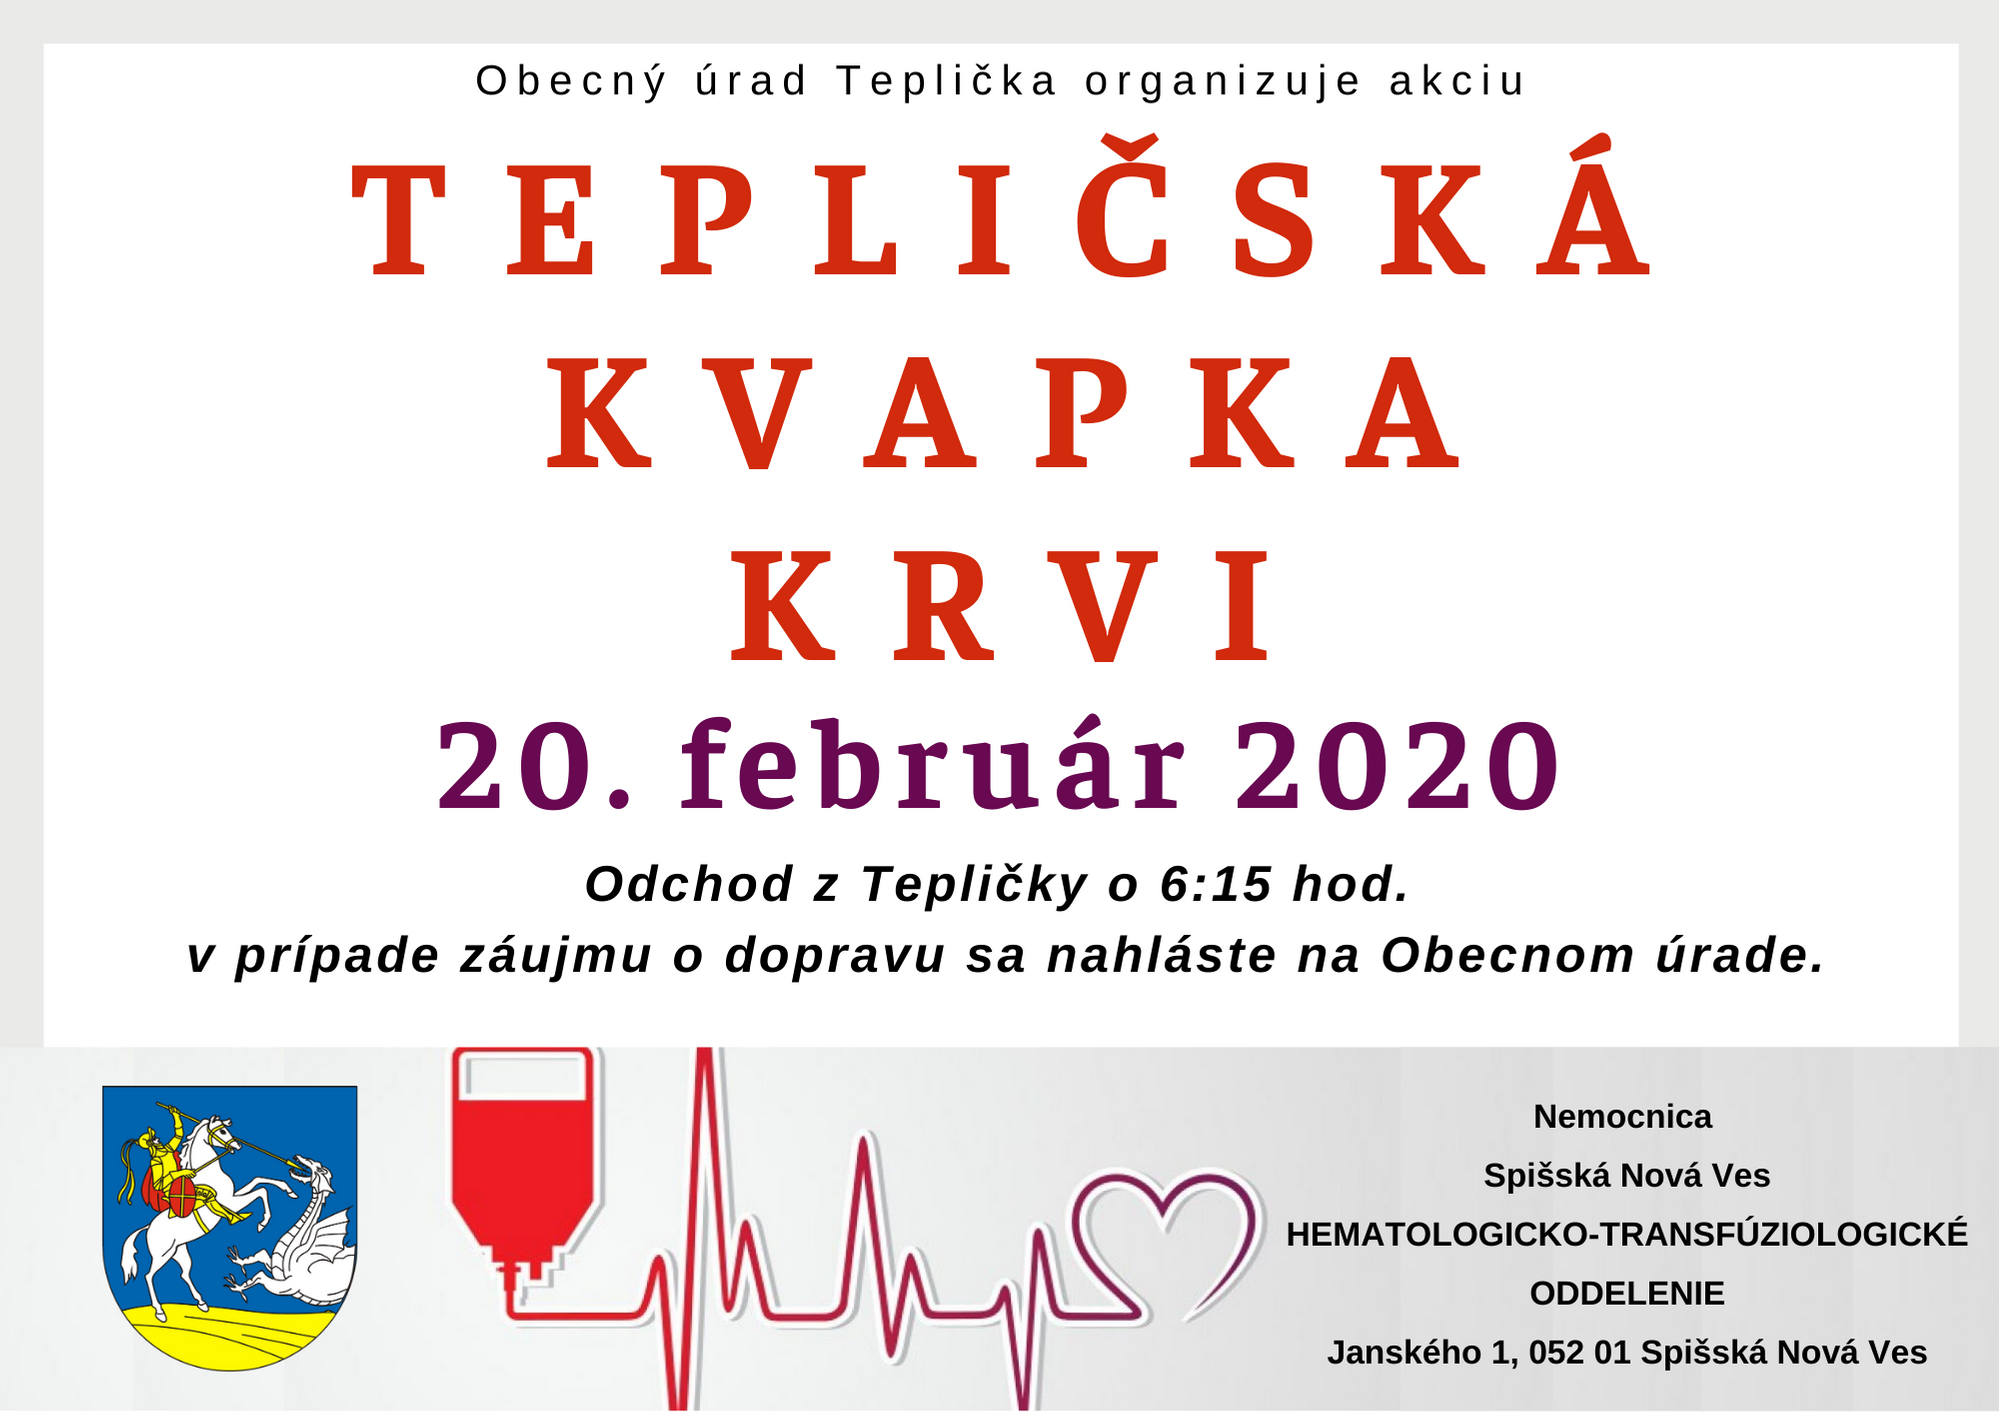 kvapka-krvi-2020.png